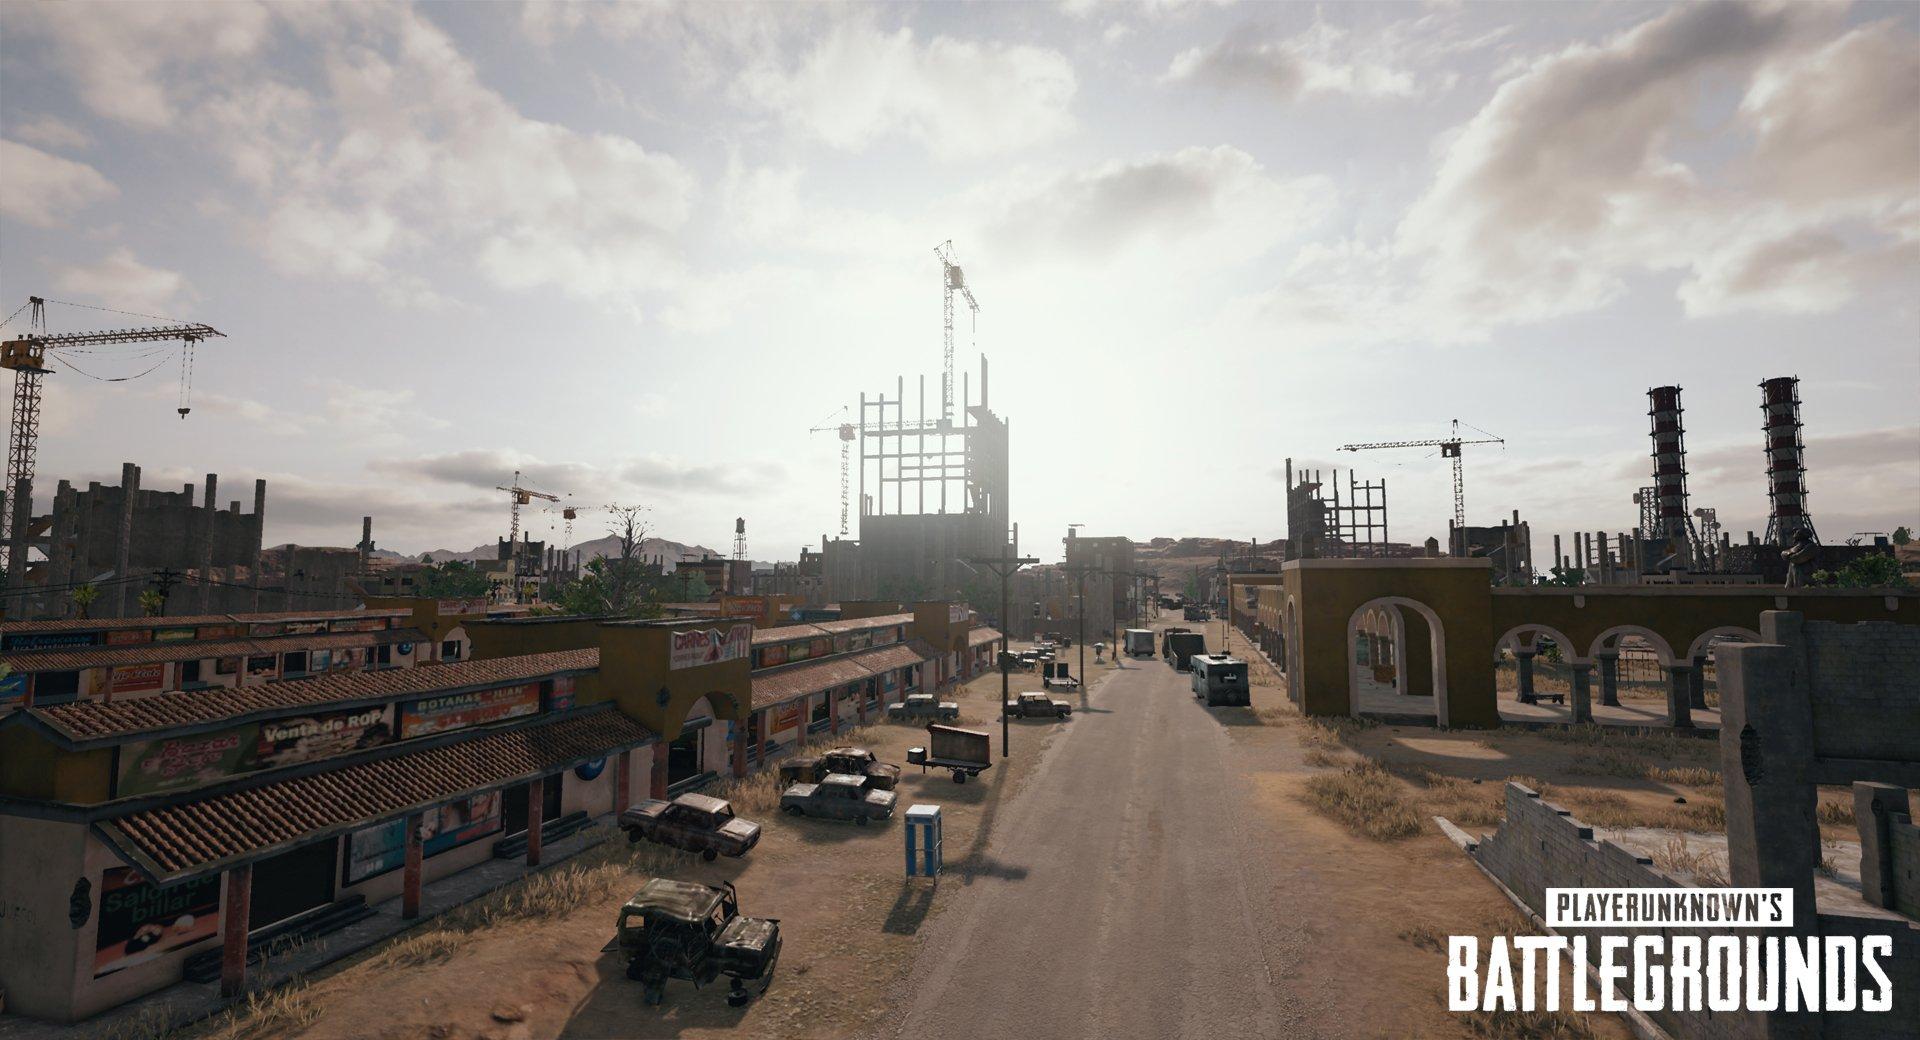 PlayerUnknown's Battlegrounds: see new screenshots of the upcoming desert map